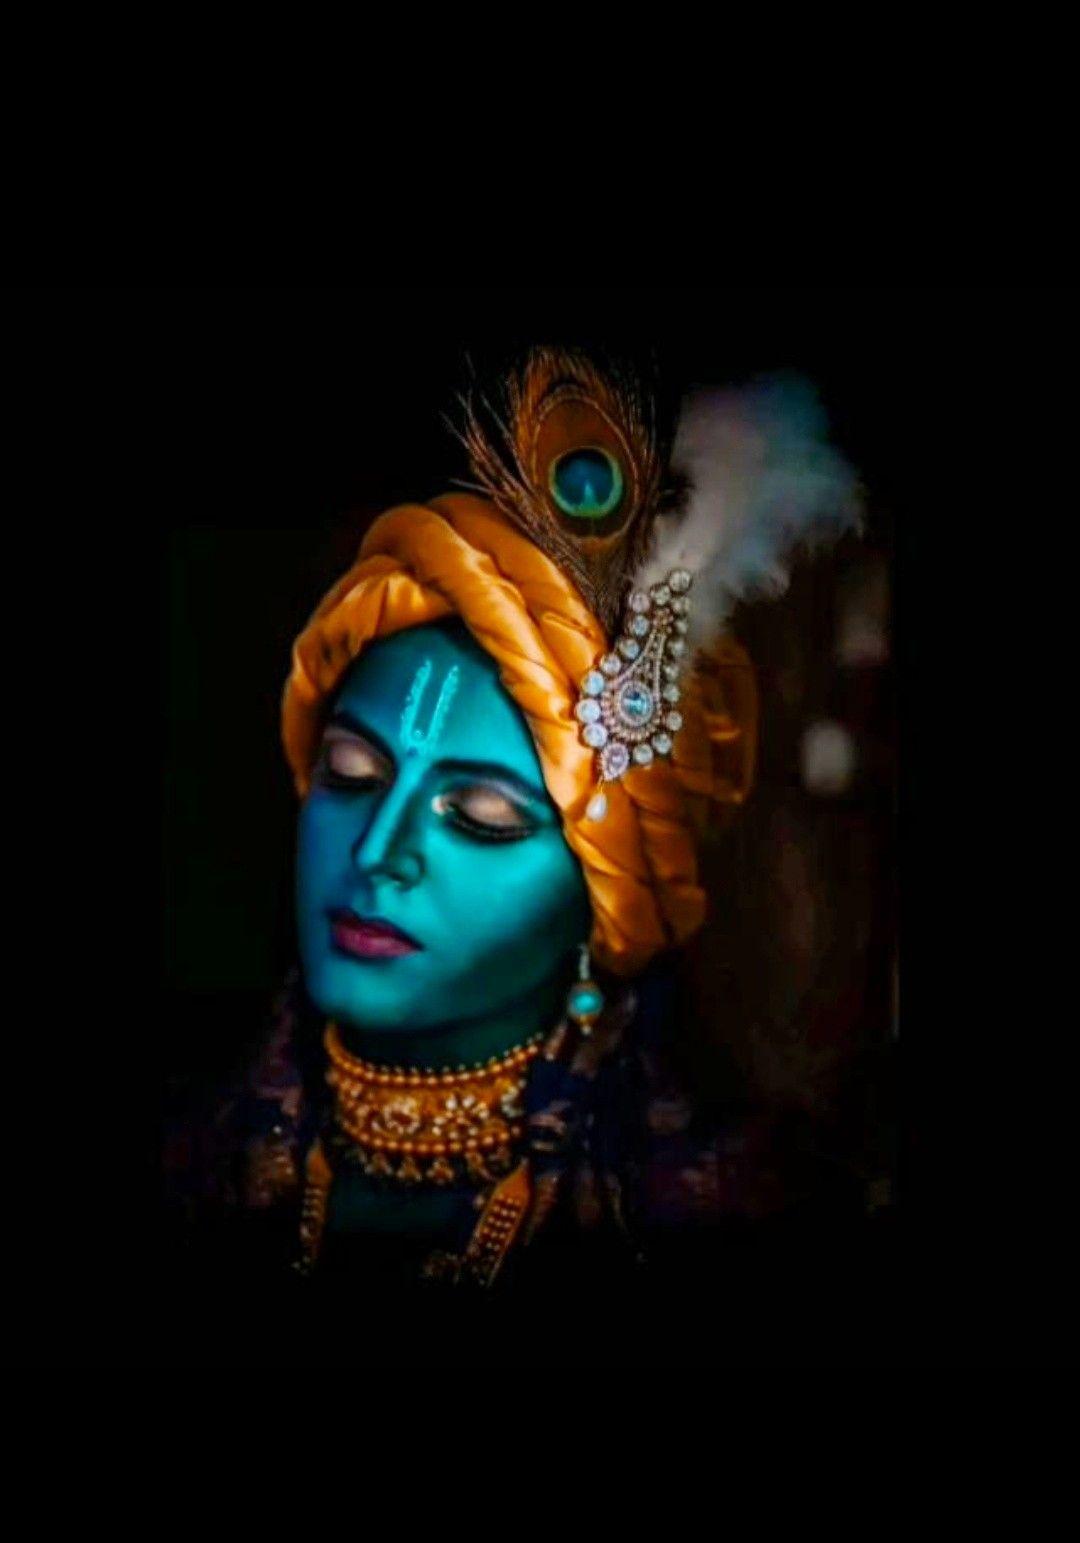 pin by aditya shirsath on shiva in 2020 lord krishna hd wallpaper krishna avatar radha krishna art pinterest